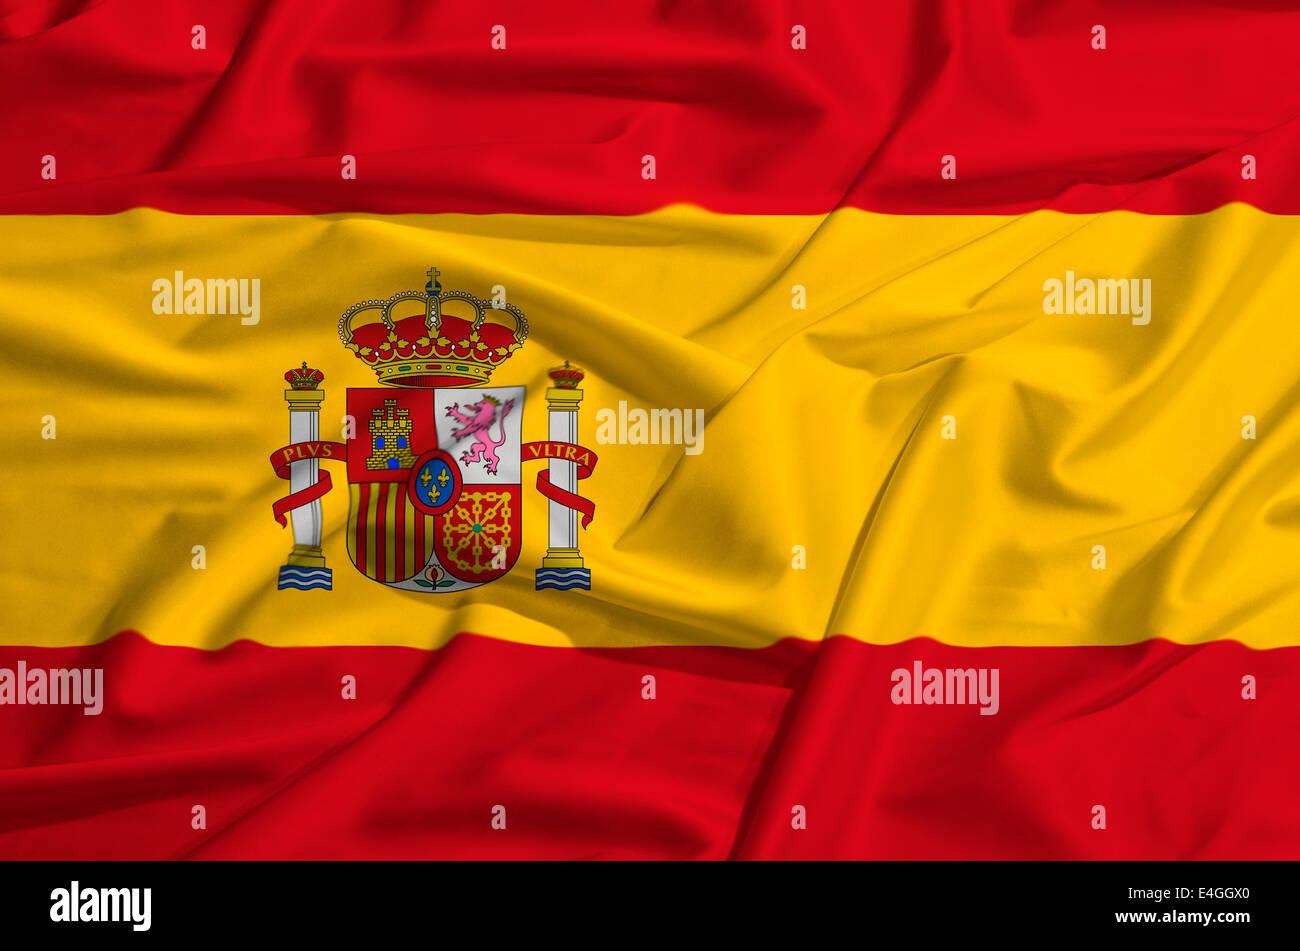 Spain flag on a silk drape waving - Stock Image